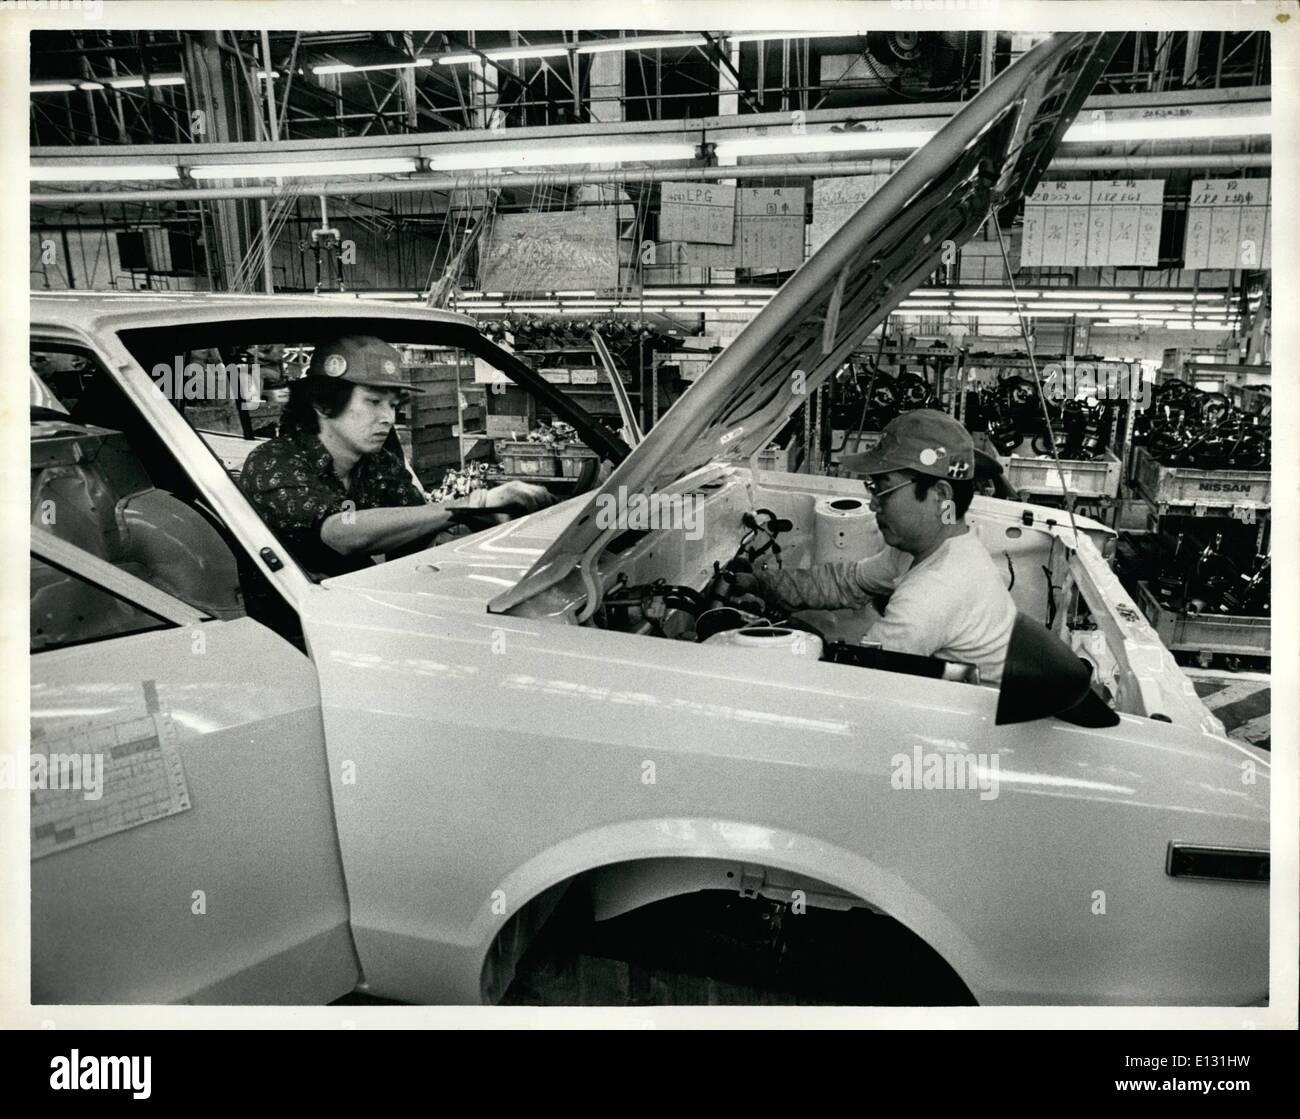 Feb. 26, 2012 - Tuesday, April 10th, 1979. Nissan Motors Oppama Plant, Oppama, Japan. Nissan Motor Co. Ltd. produces Stock Photo